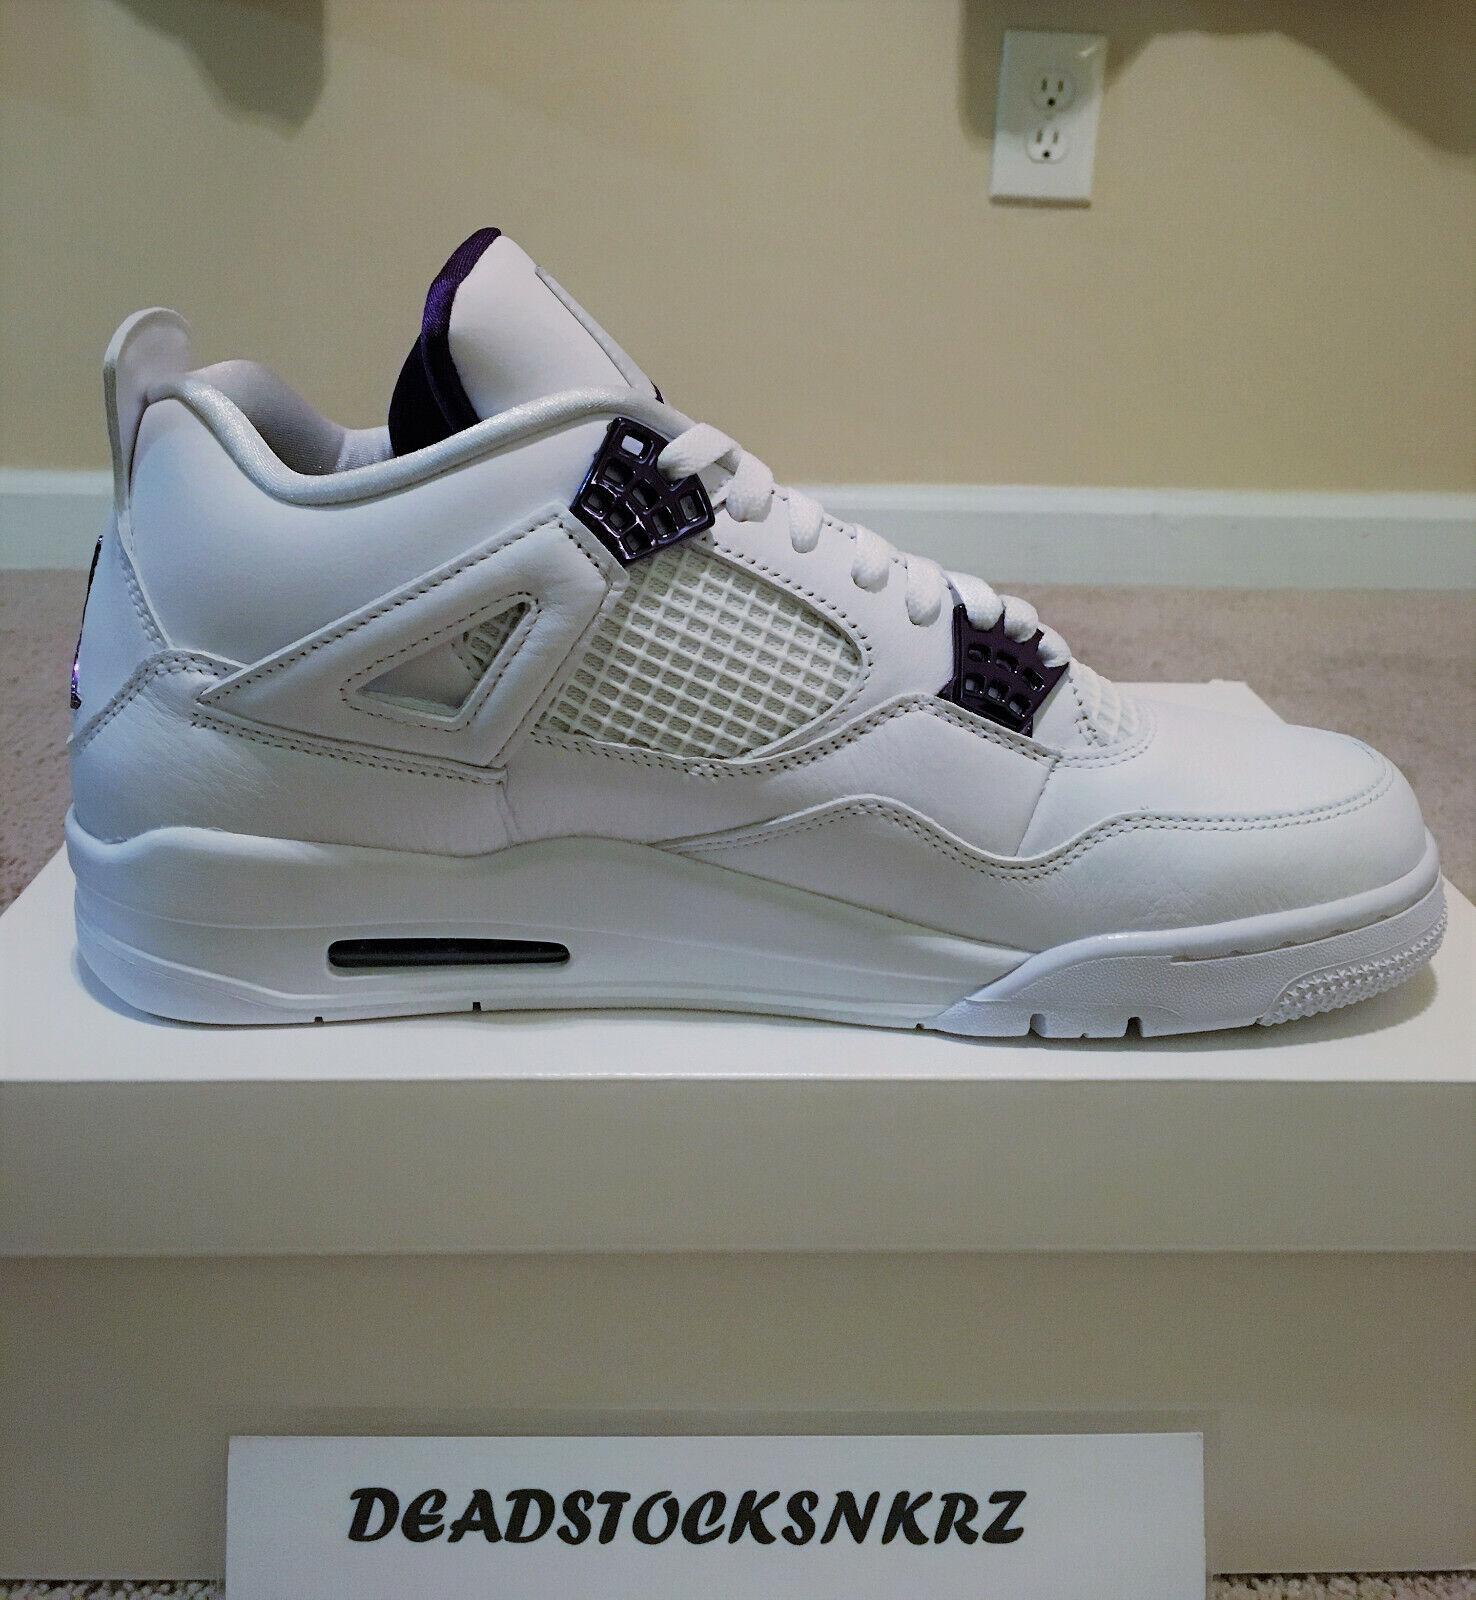 Size 14 - Jordan 4 Retro Metallic Pack - Court Purple 2020 for ...